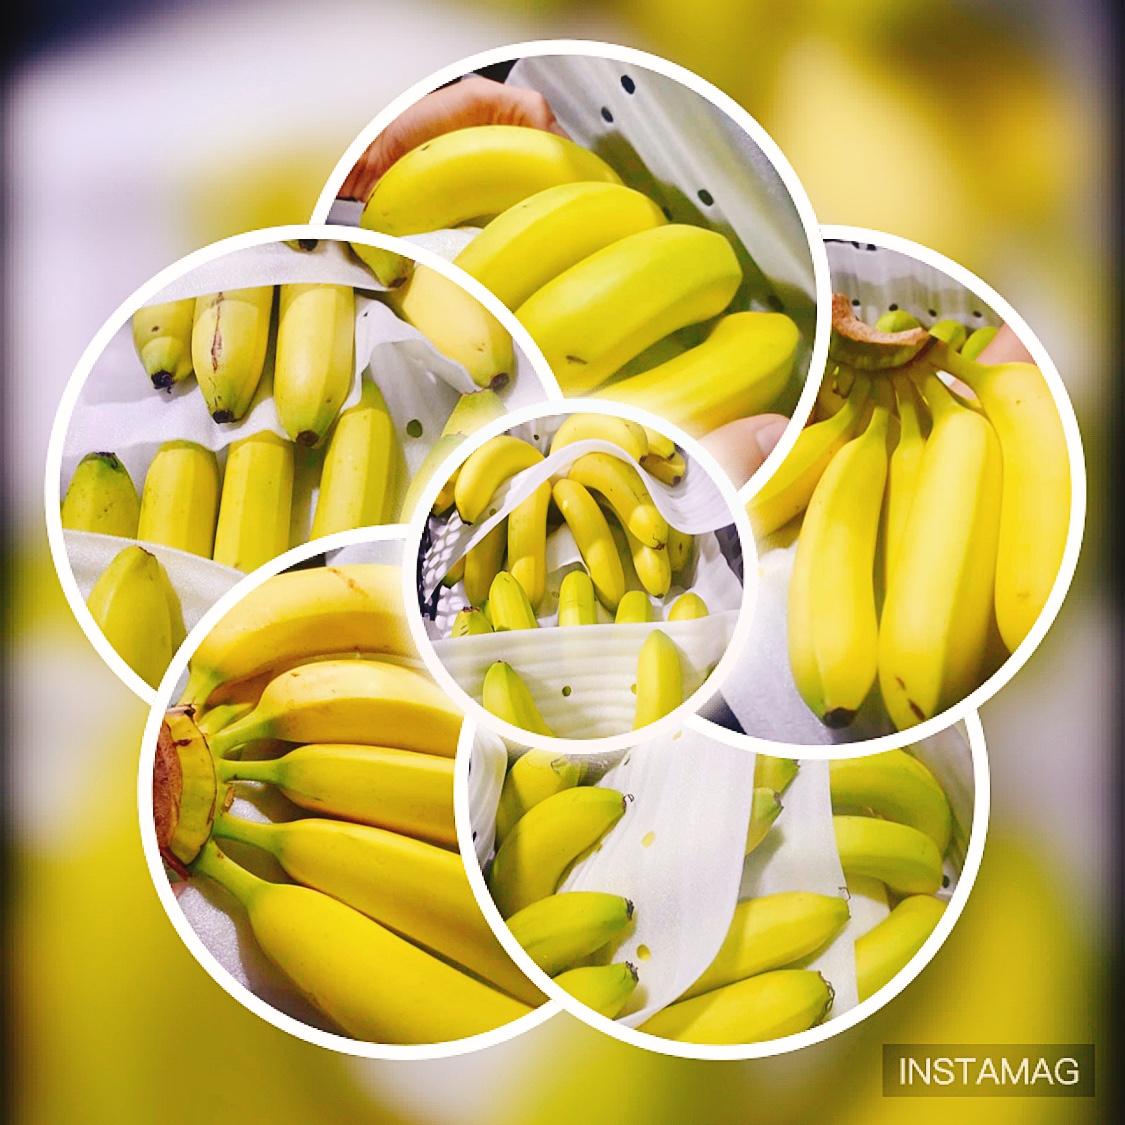 chuoi nen an bao nhieu trai moi ngay la tot nhat cavendish banana hinh anh